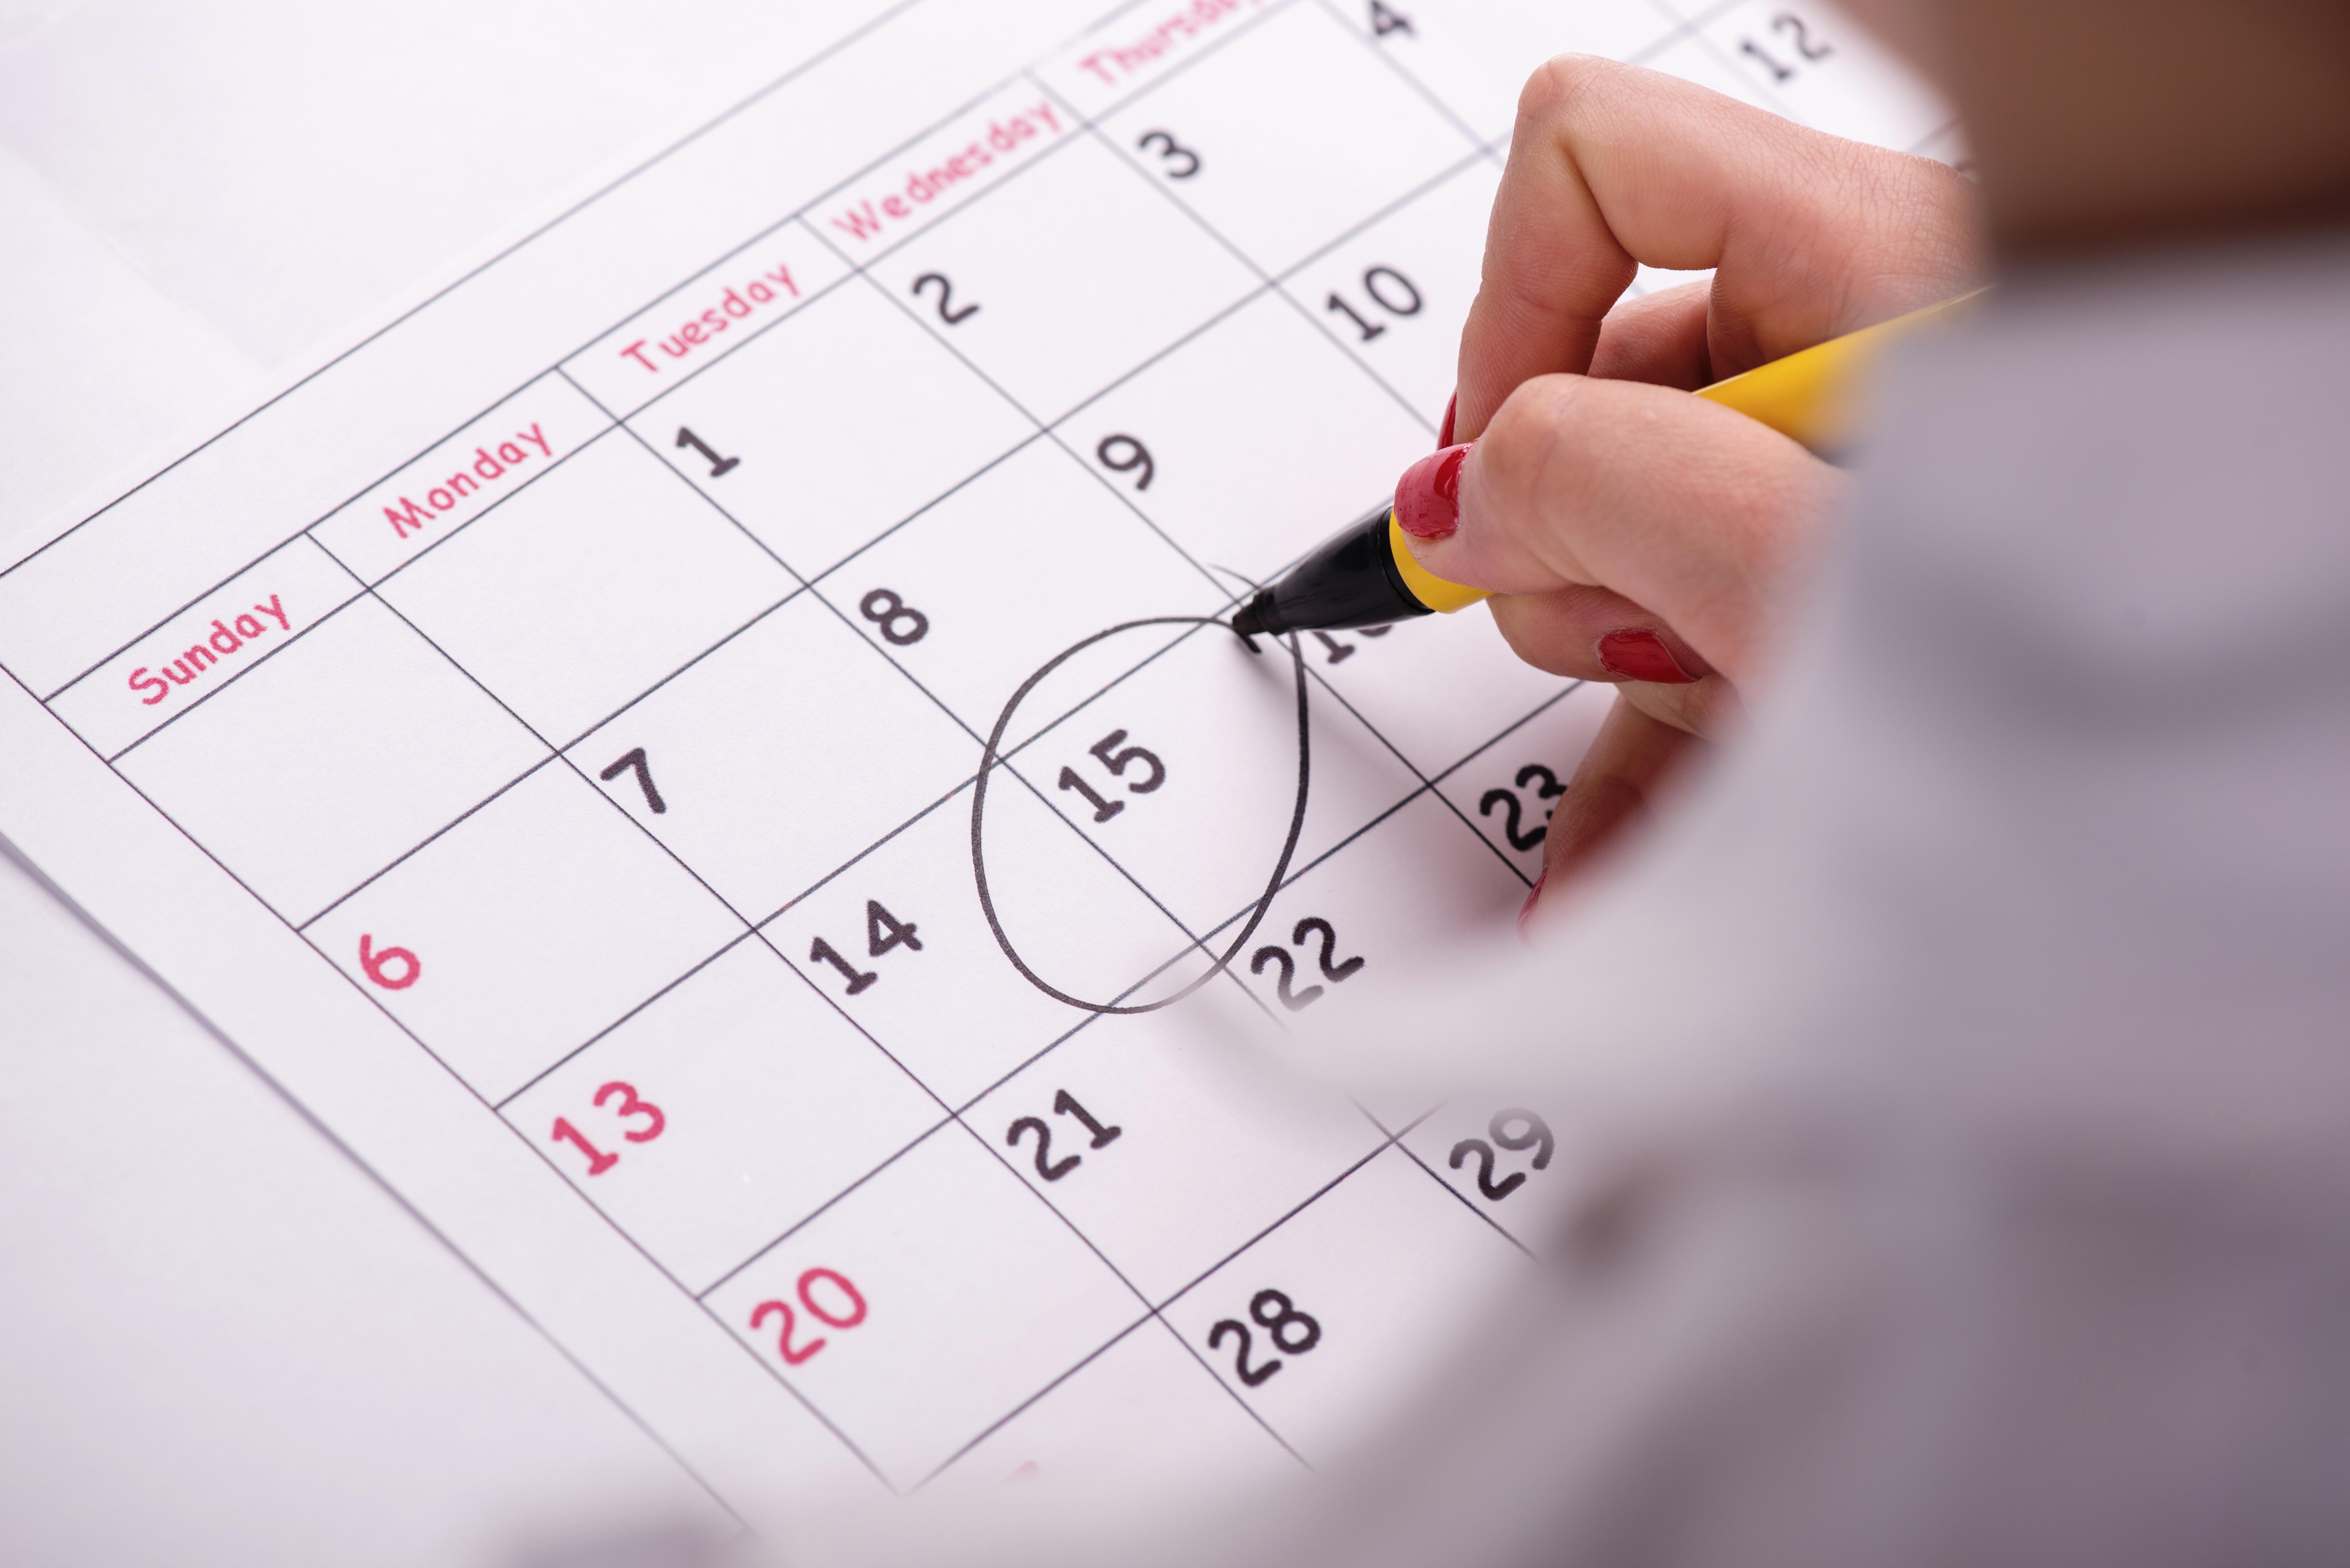 Mujer marcando sus días fértiles en un calendario